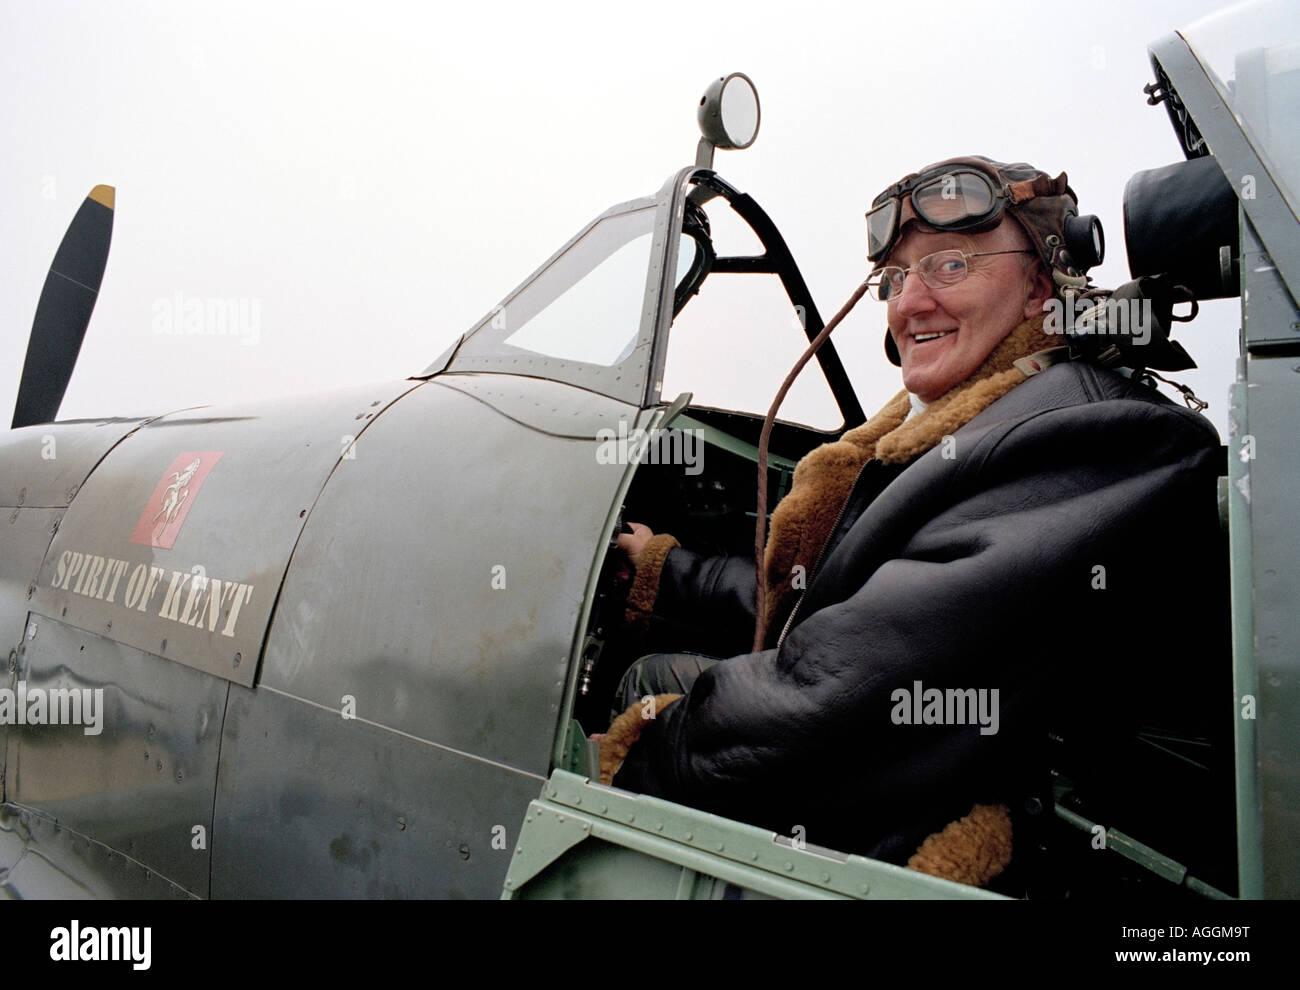 METAL Spitfire Lapel Pin Badge JKB0222 Spitfire RAF Avion Tissé Homme Chaussettes